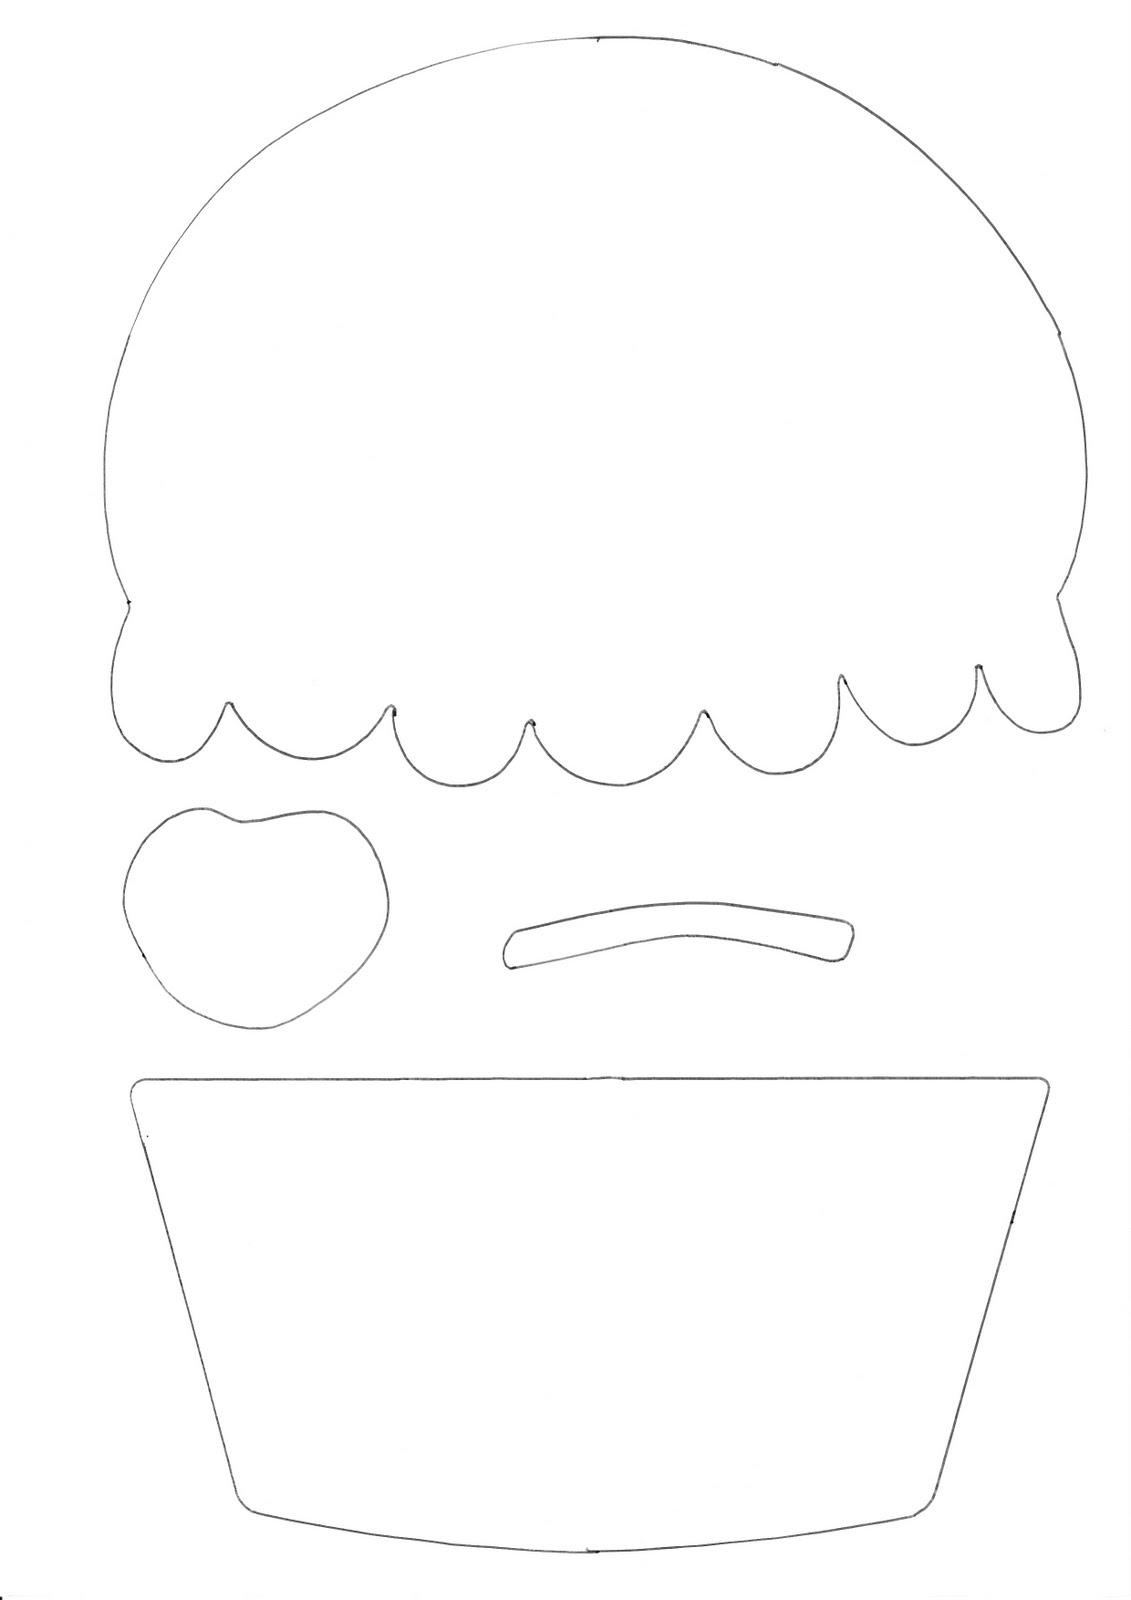 Шаблон кекса для открытки